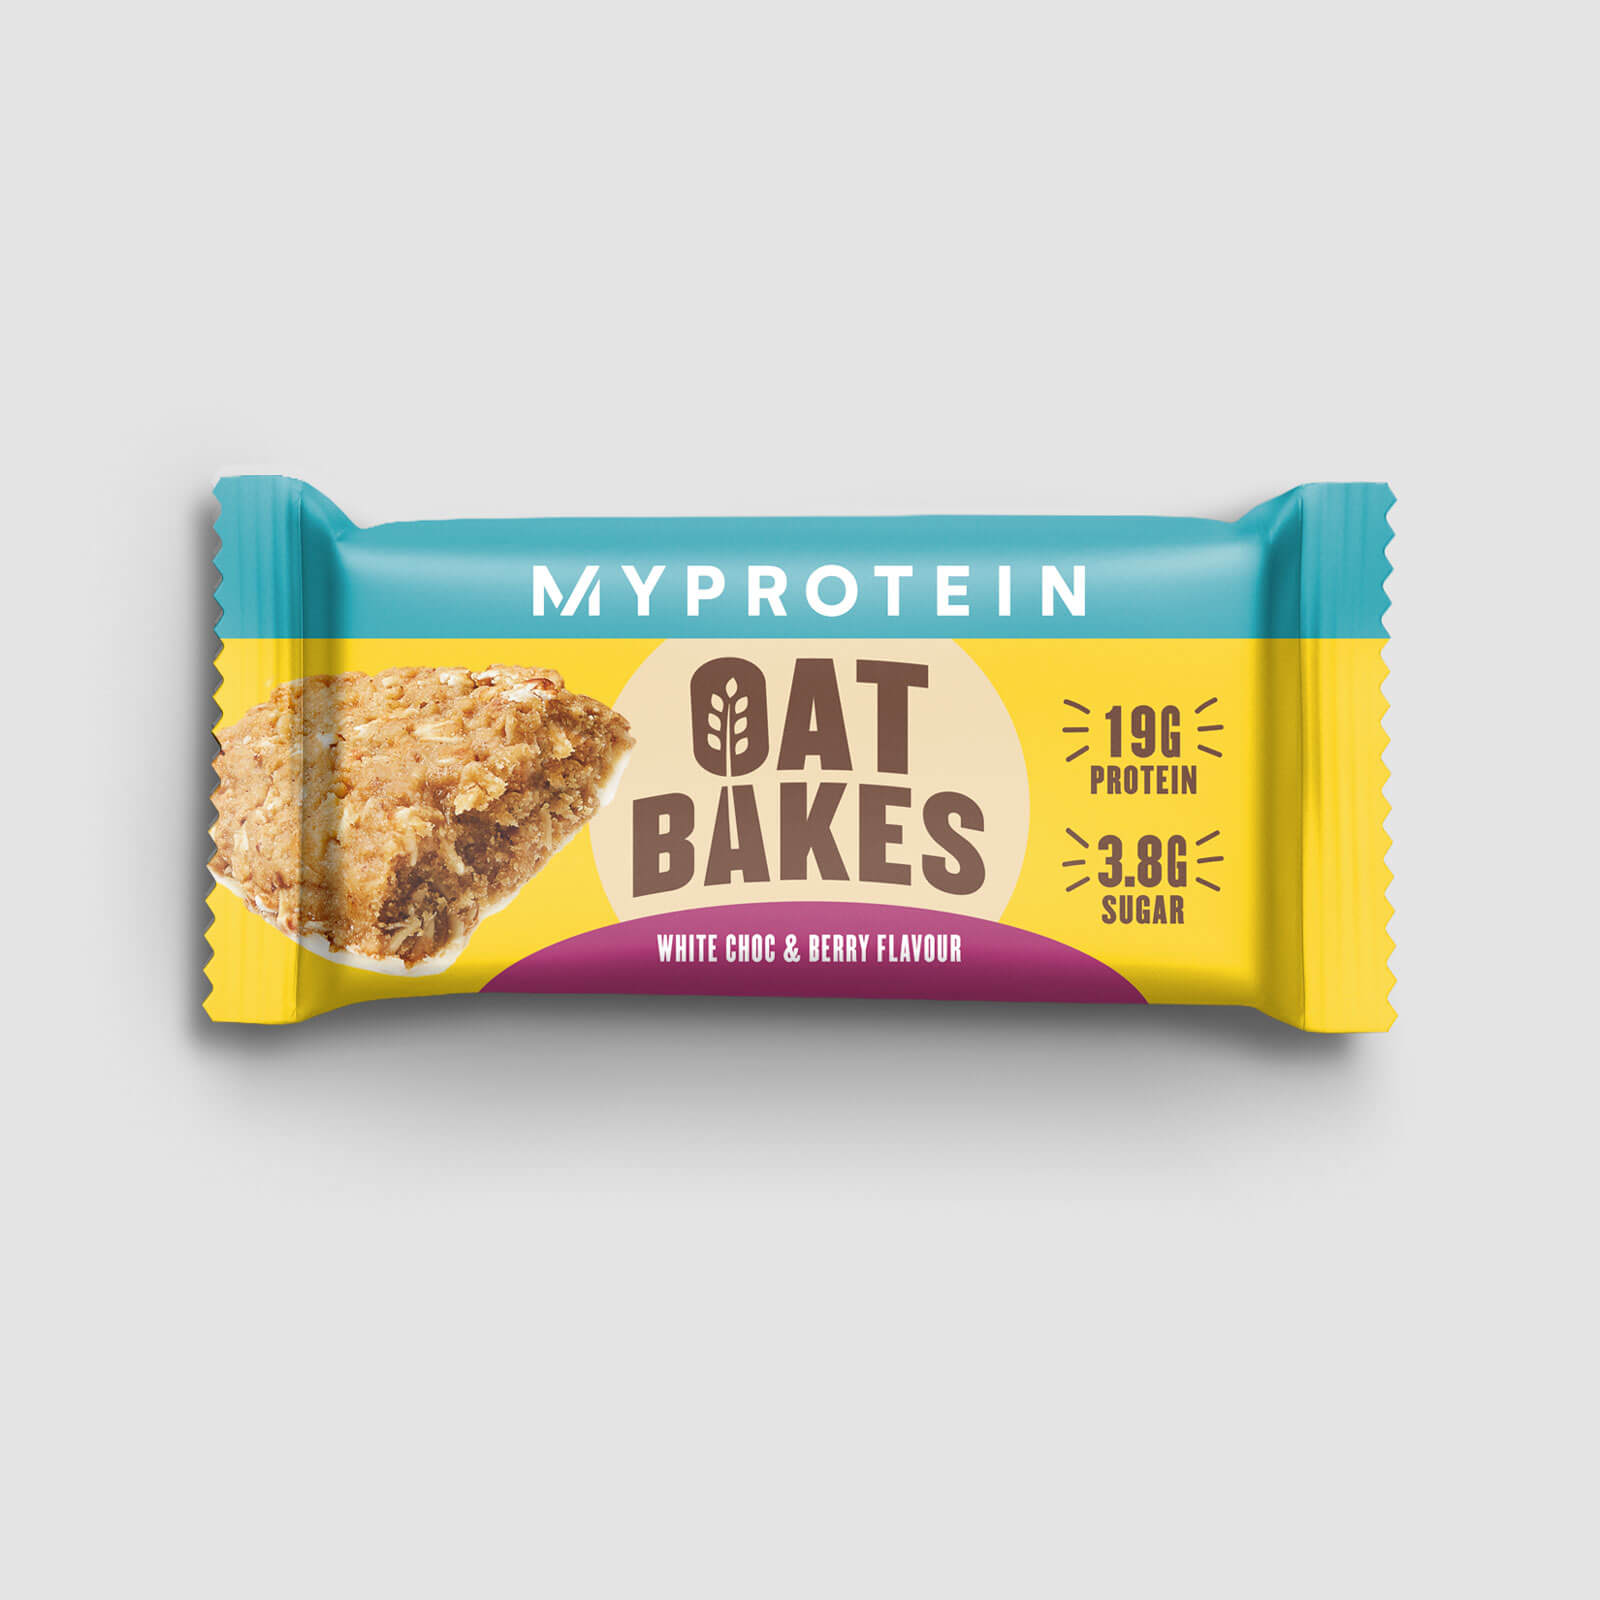 Купить Oat Bakes (Sample) - Berry and White Chocolate, Myprotein International